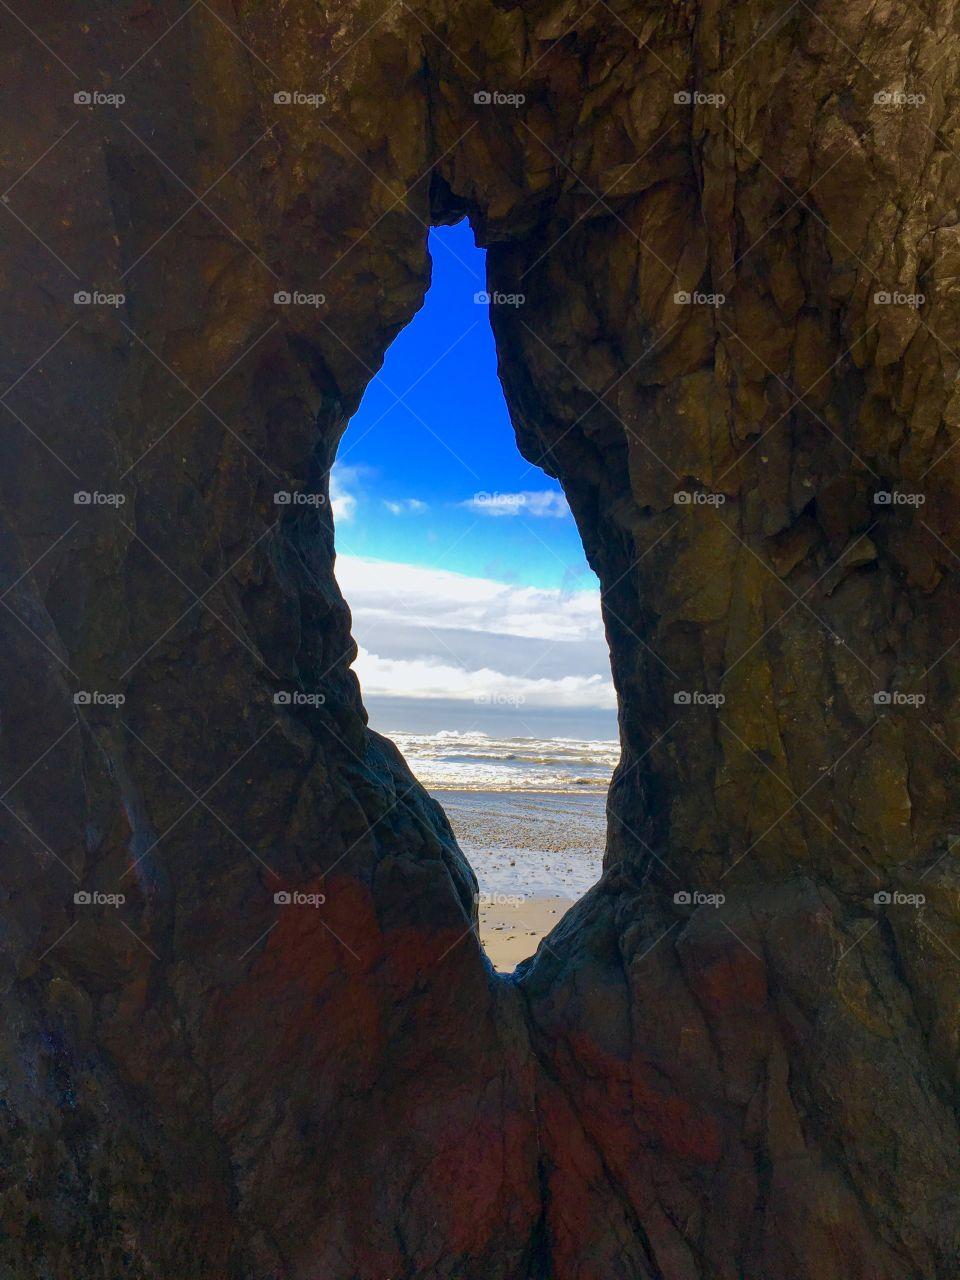 Scenic sea through cave